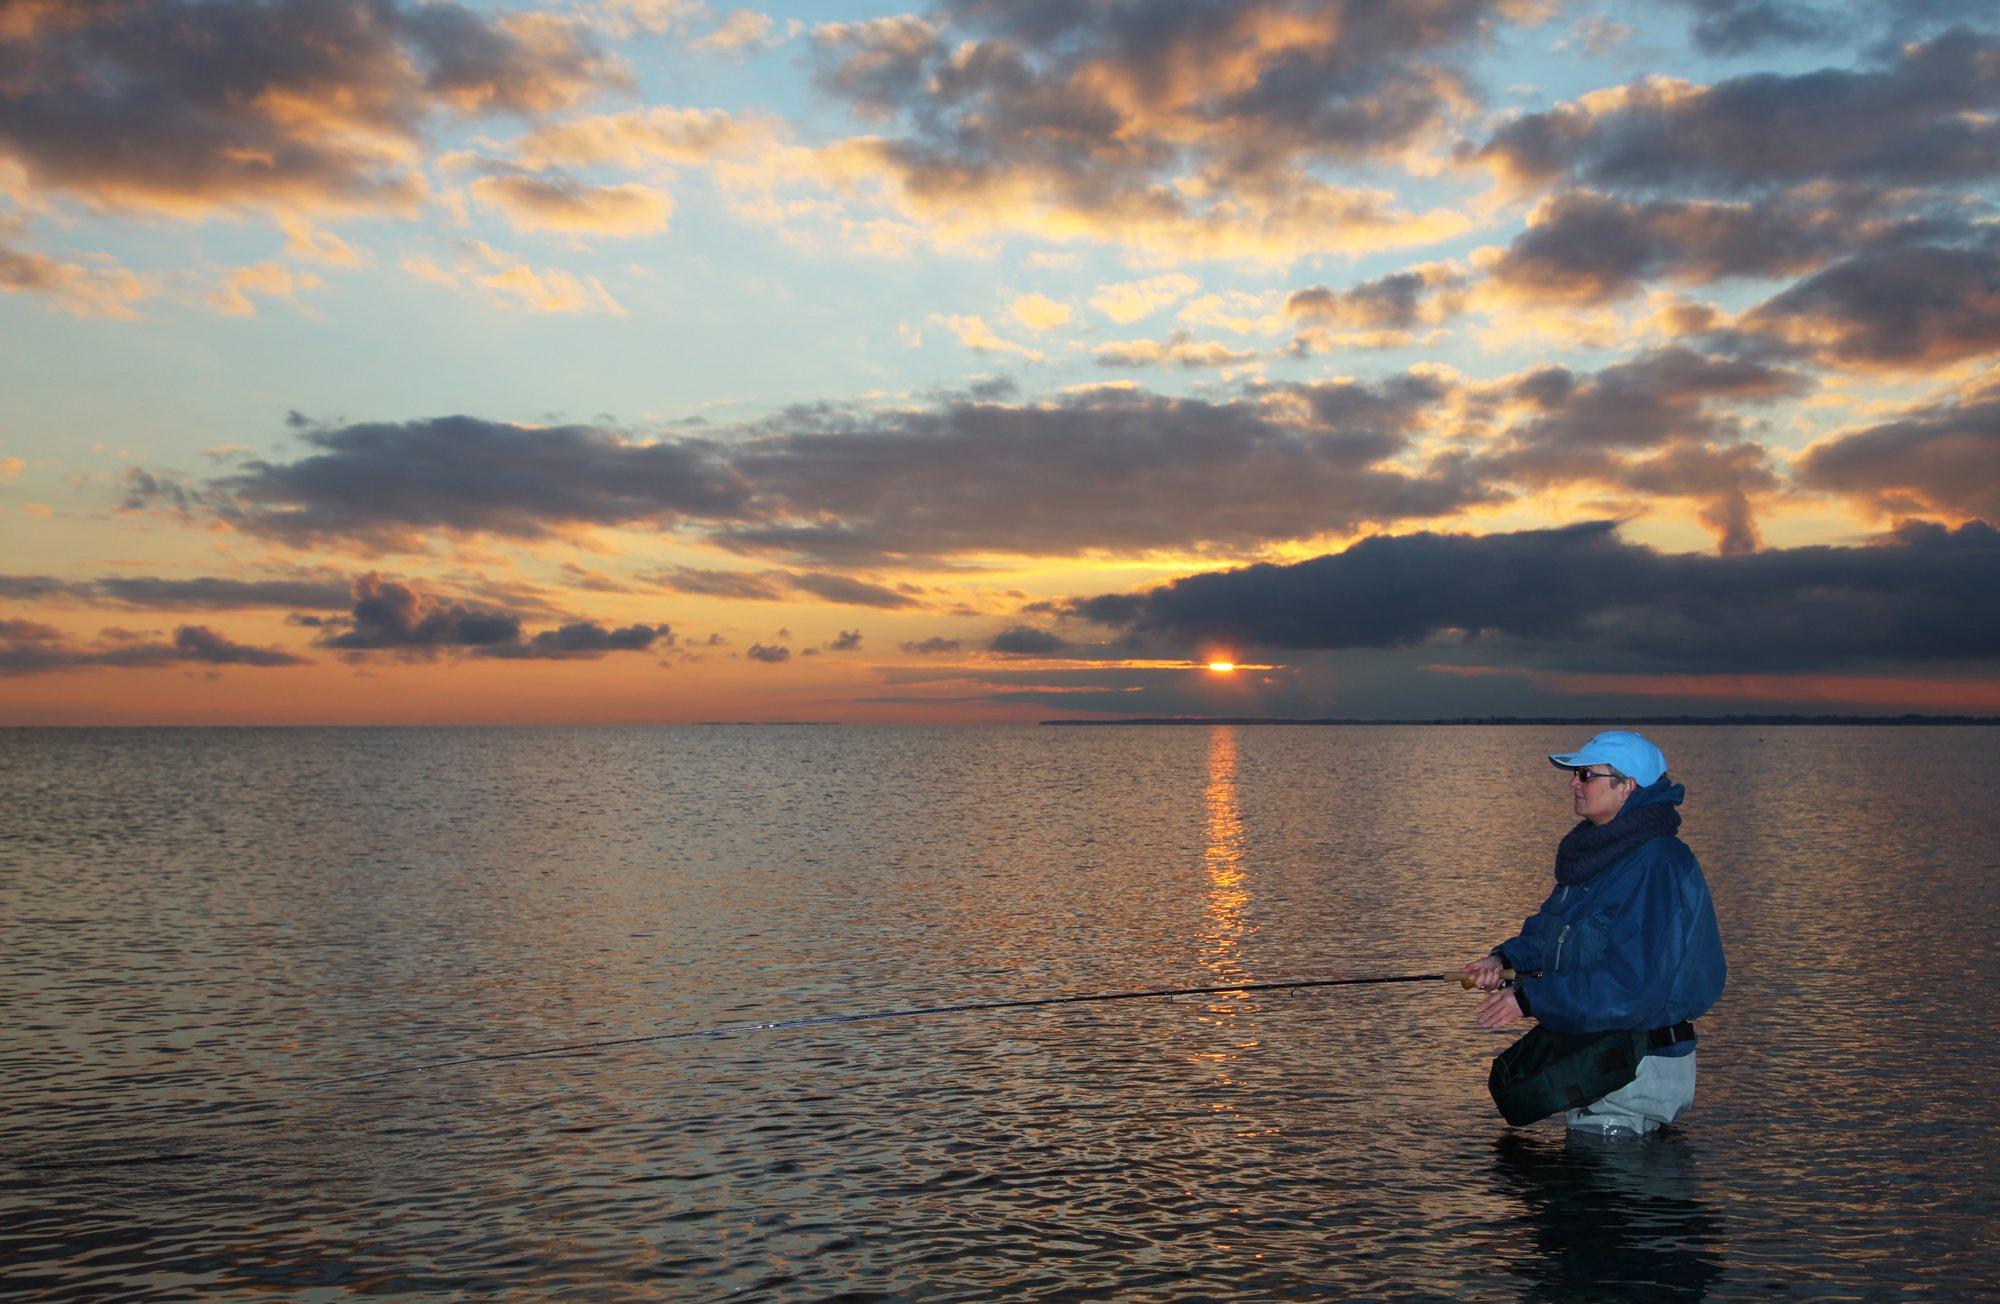 Denemarken zeeforelvissen